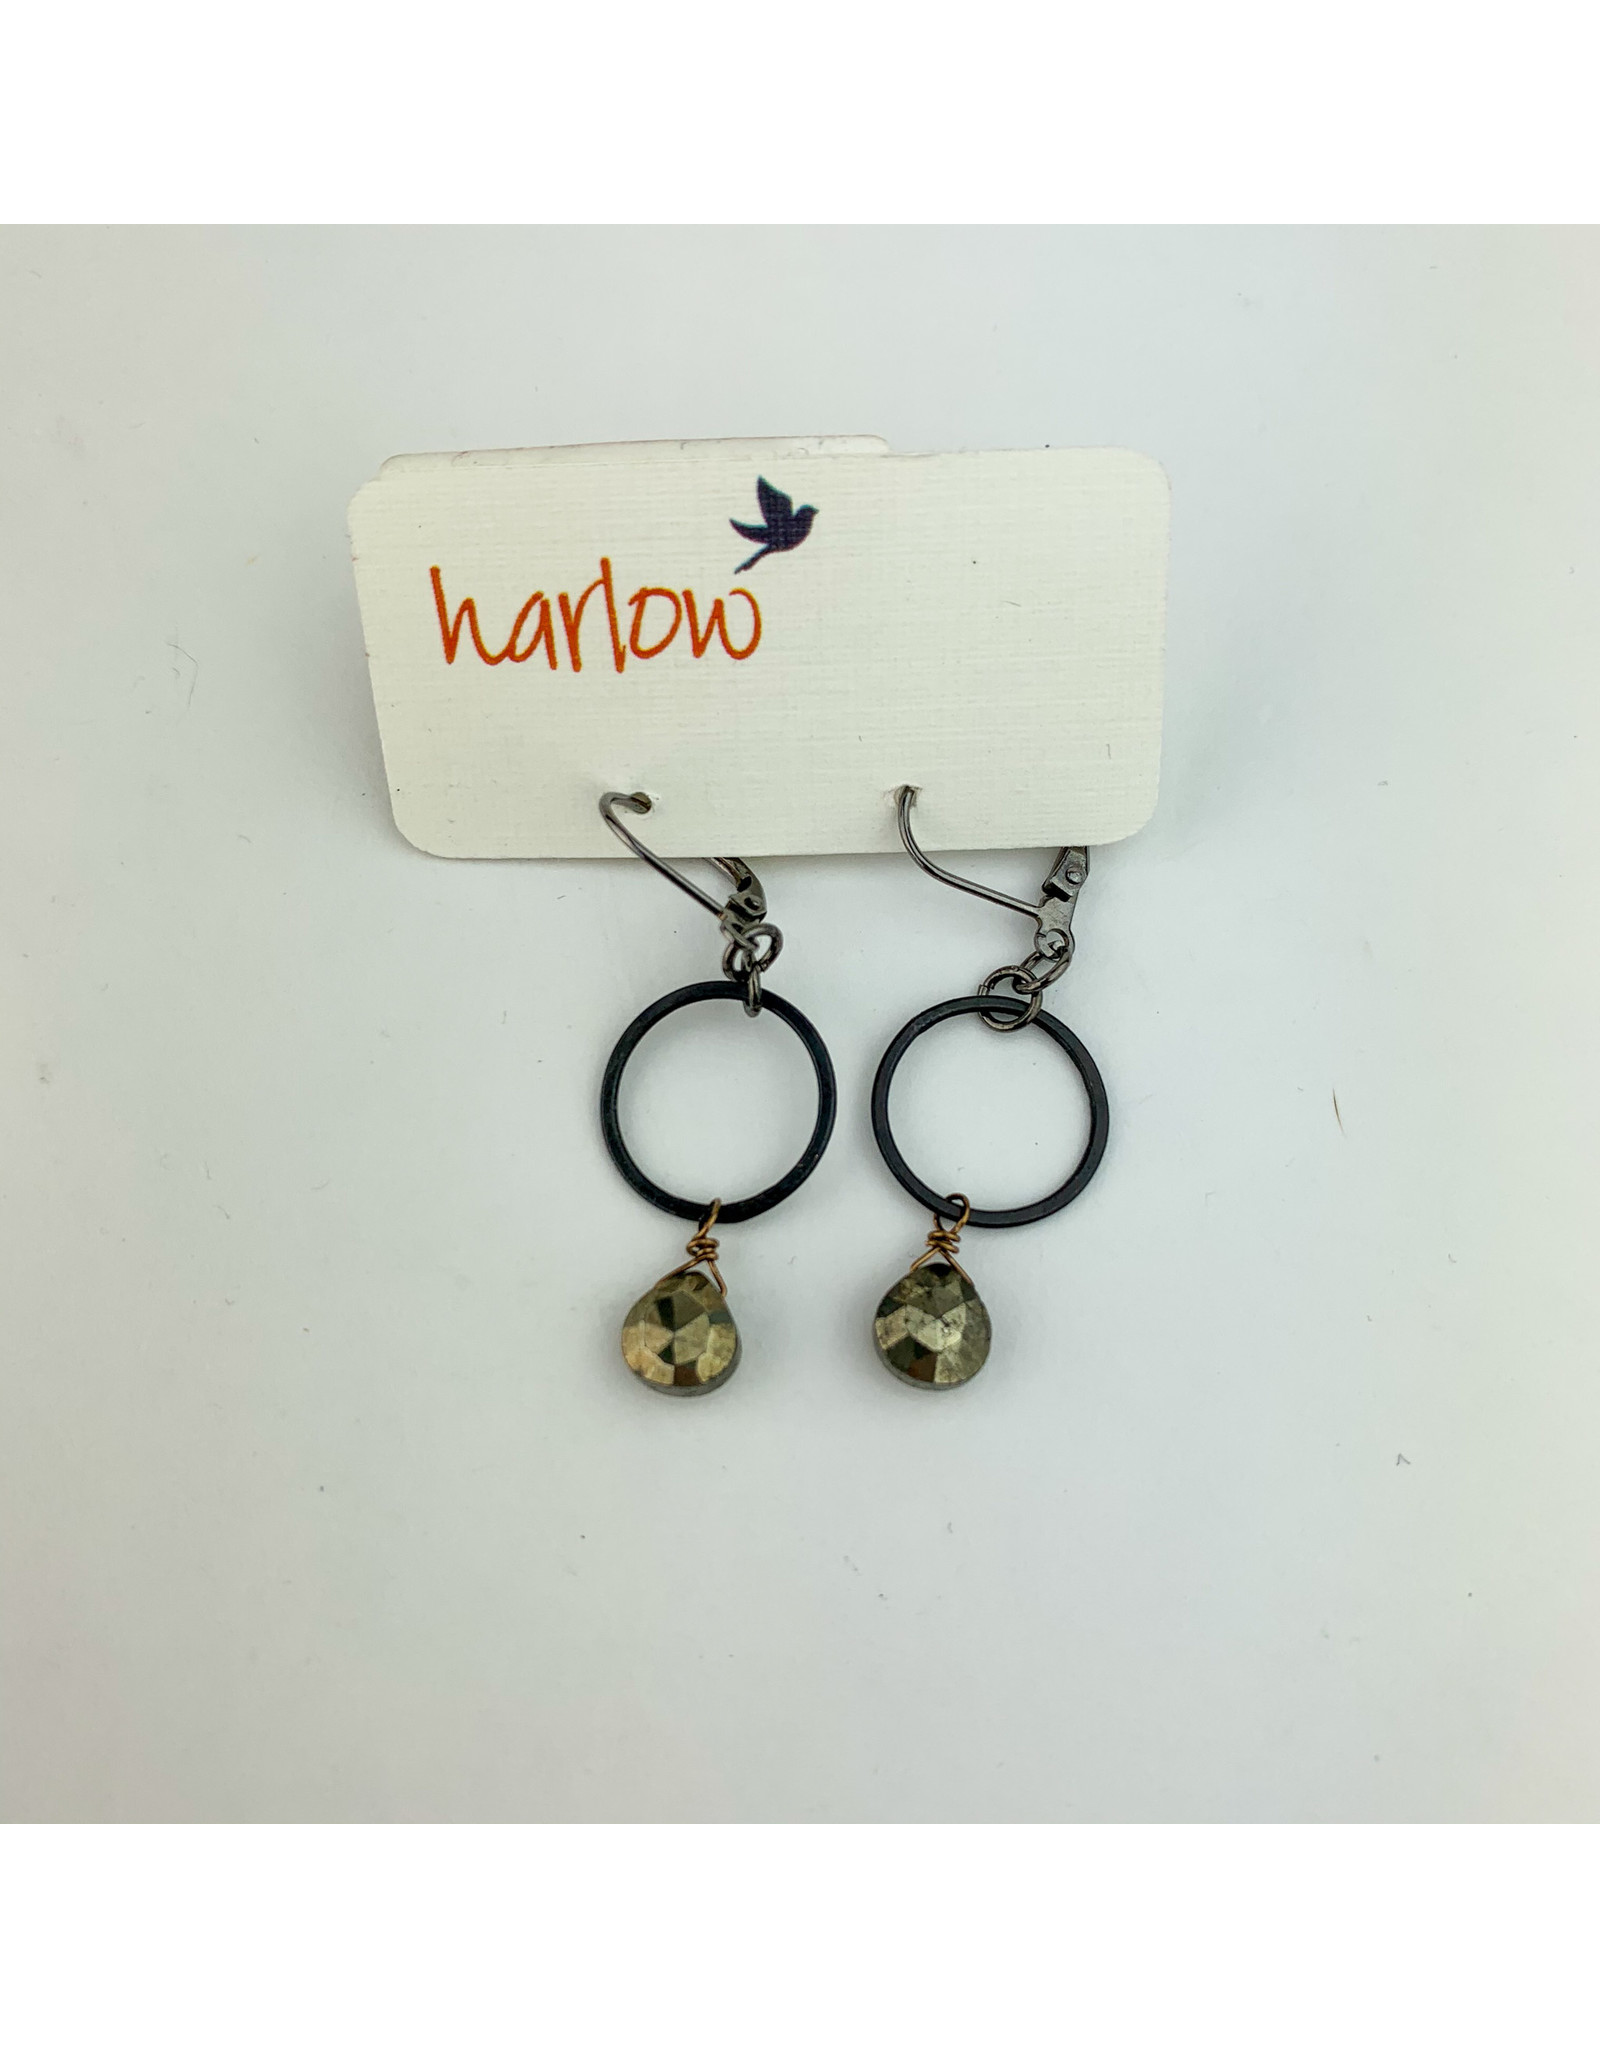 Harlow Juniper O ring earrings